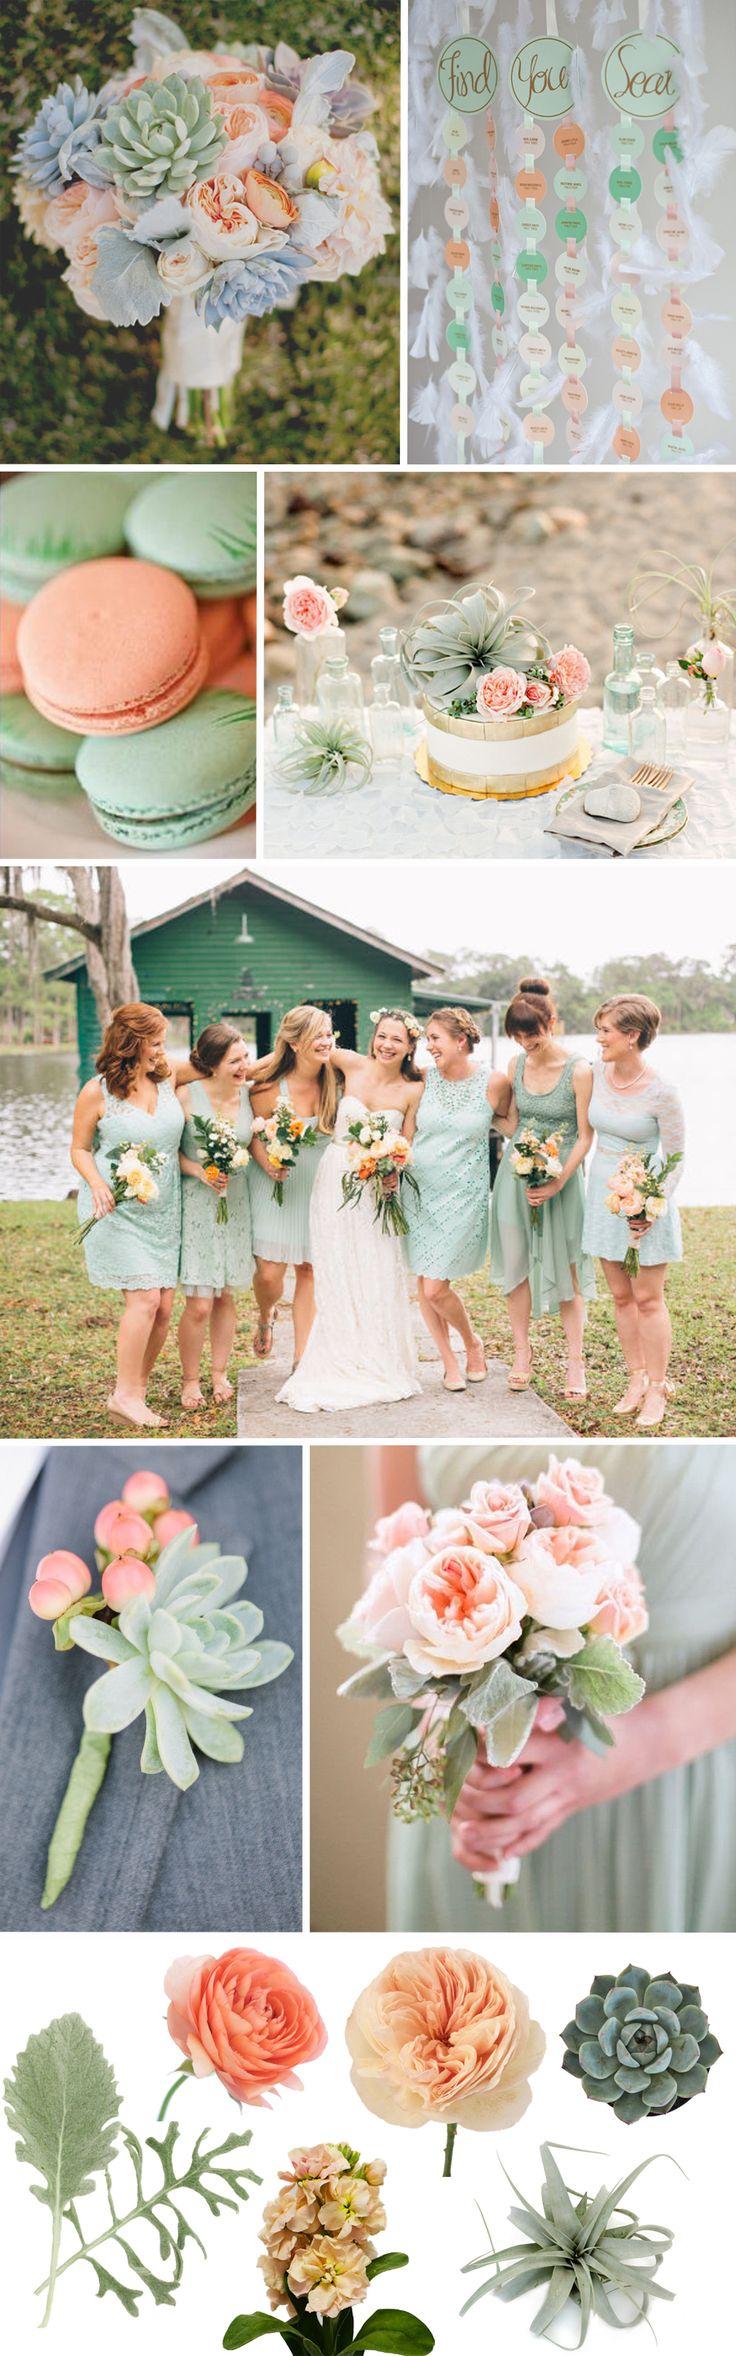 FiftyFlowers Peach & Sage Wedding Inspiration